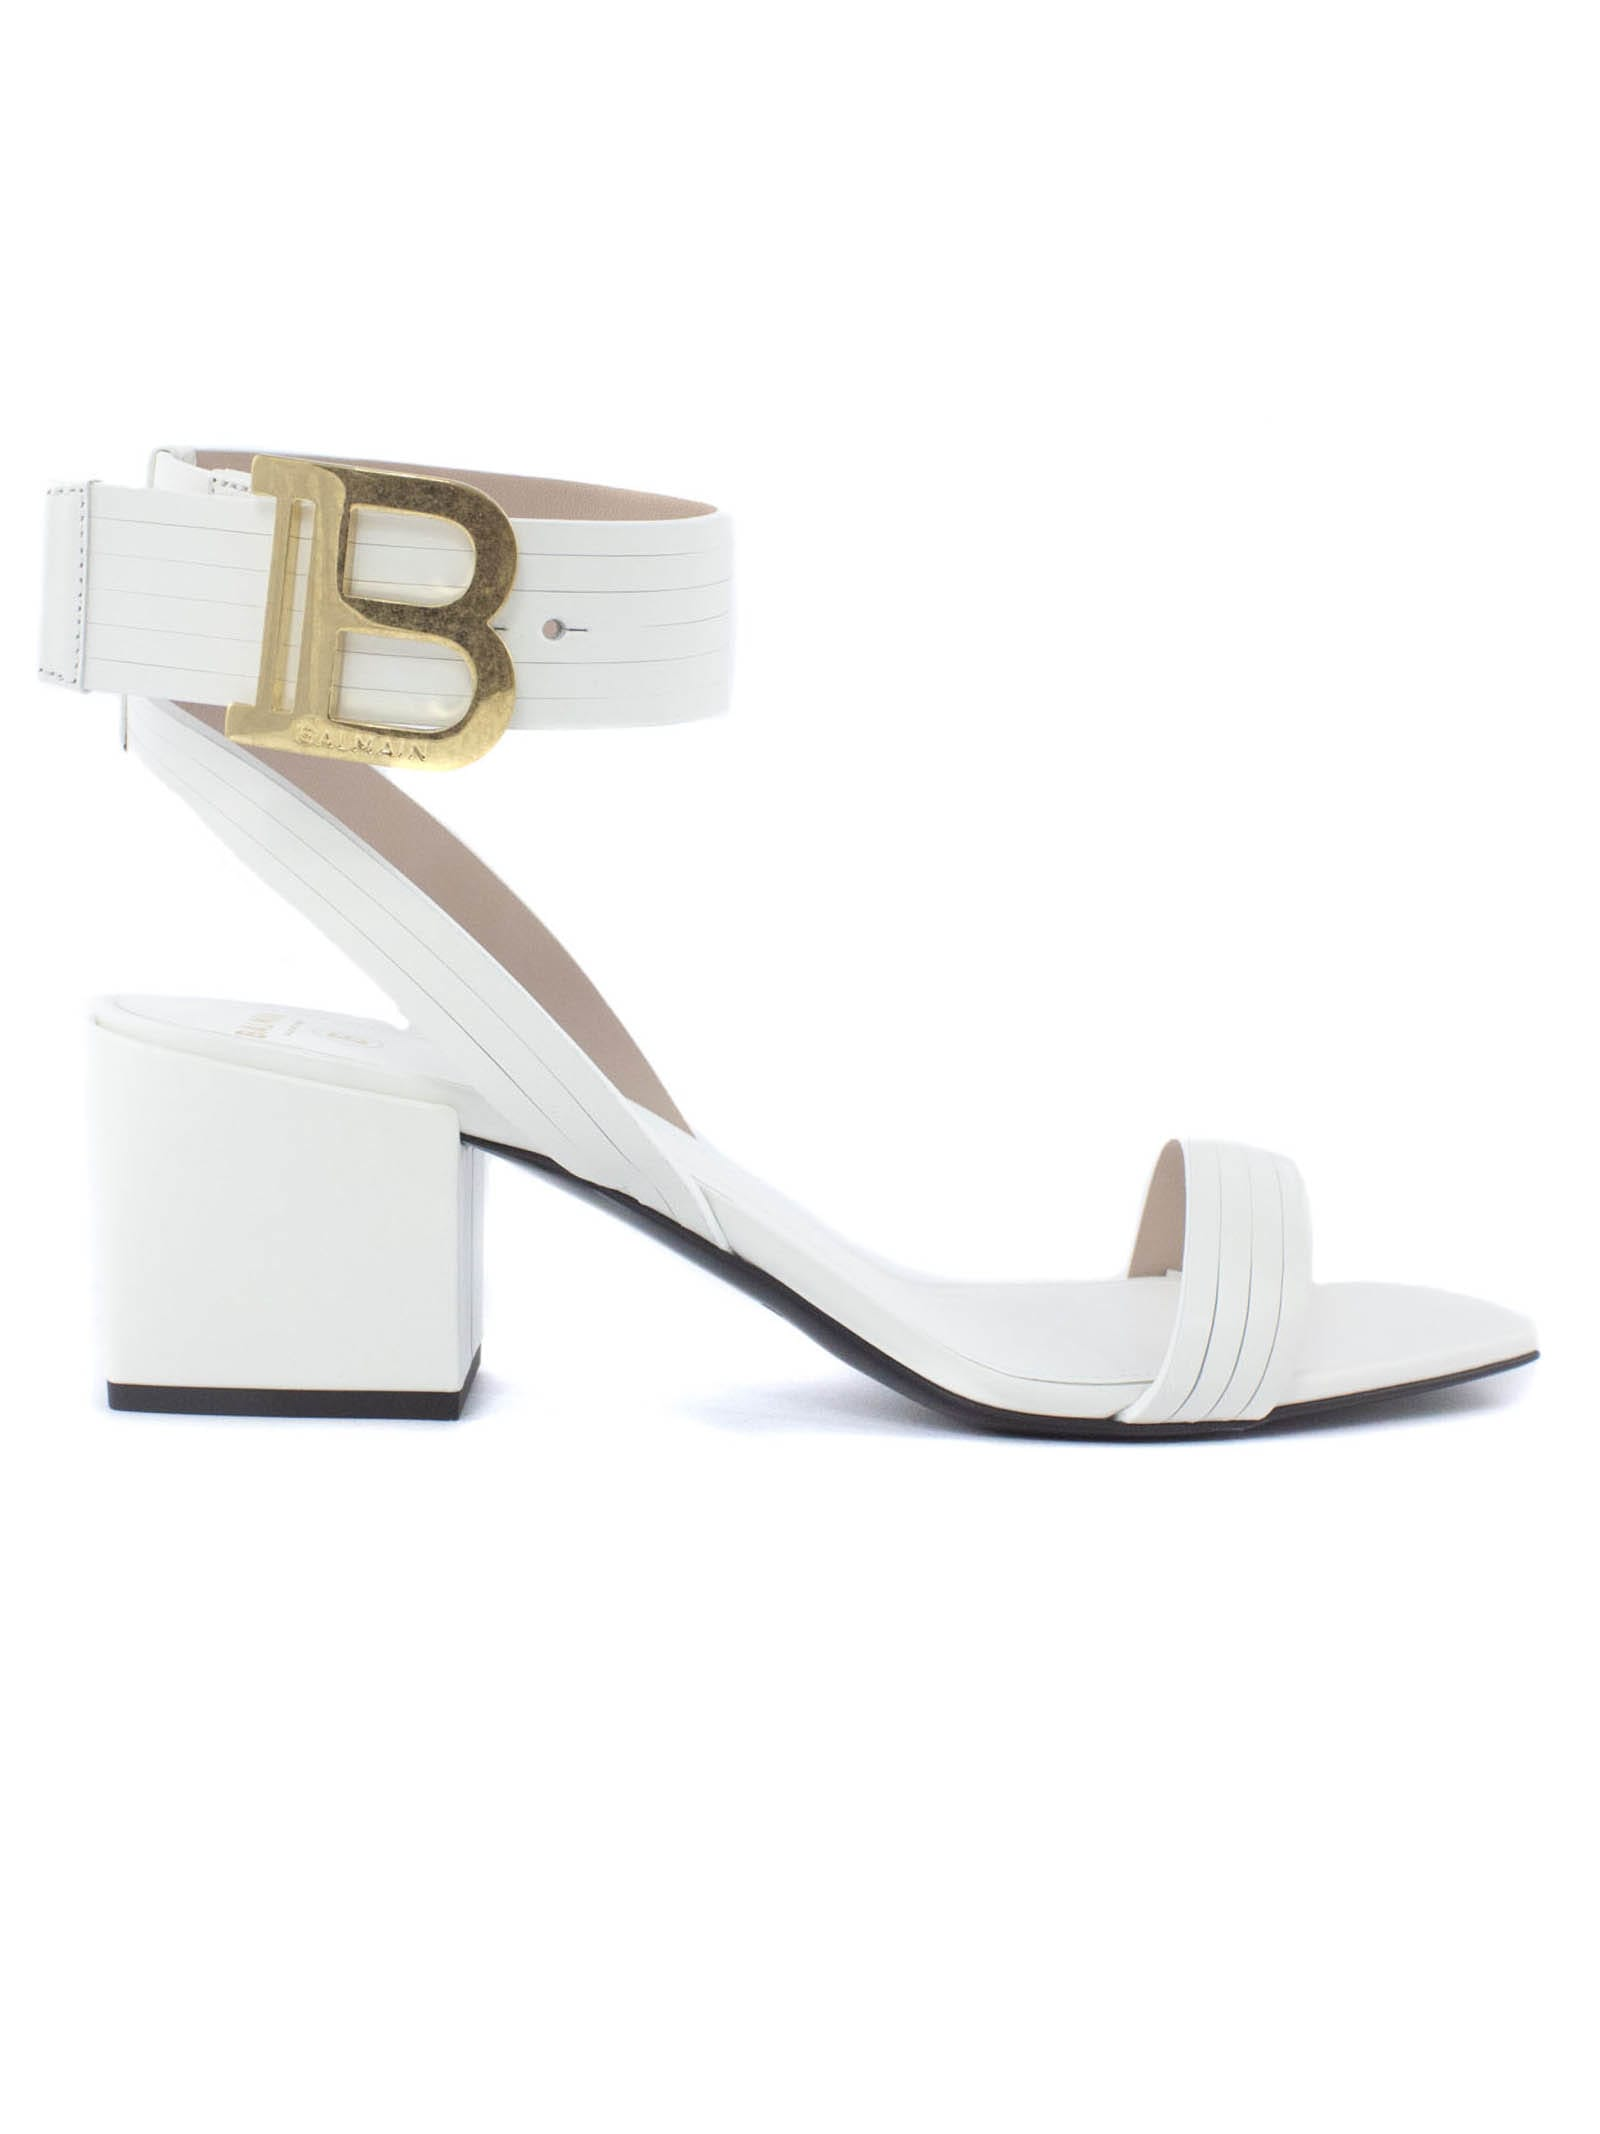 Buy Balmain Green Lambskin Stella Sandals online, shop Balmain shoes with free shipping